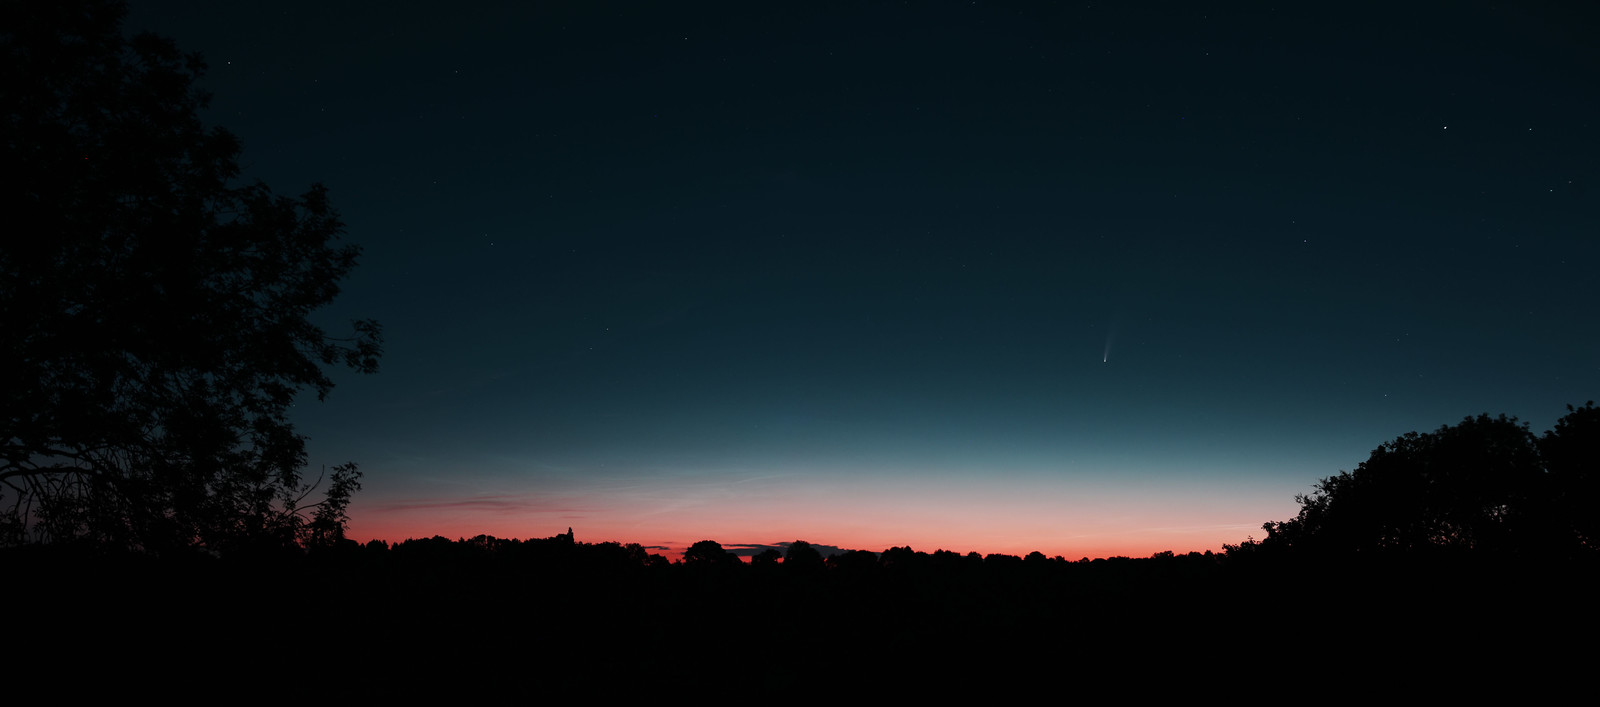 2020-07-12 Comet NEOWISE 01:52 UTC